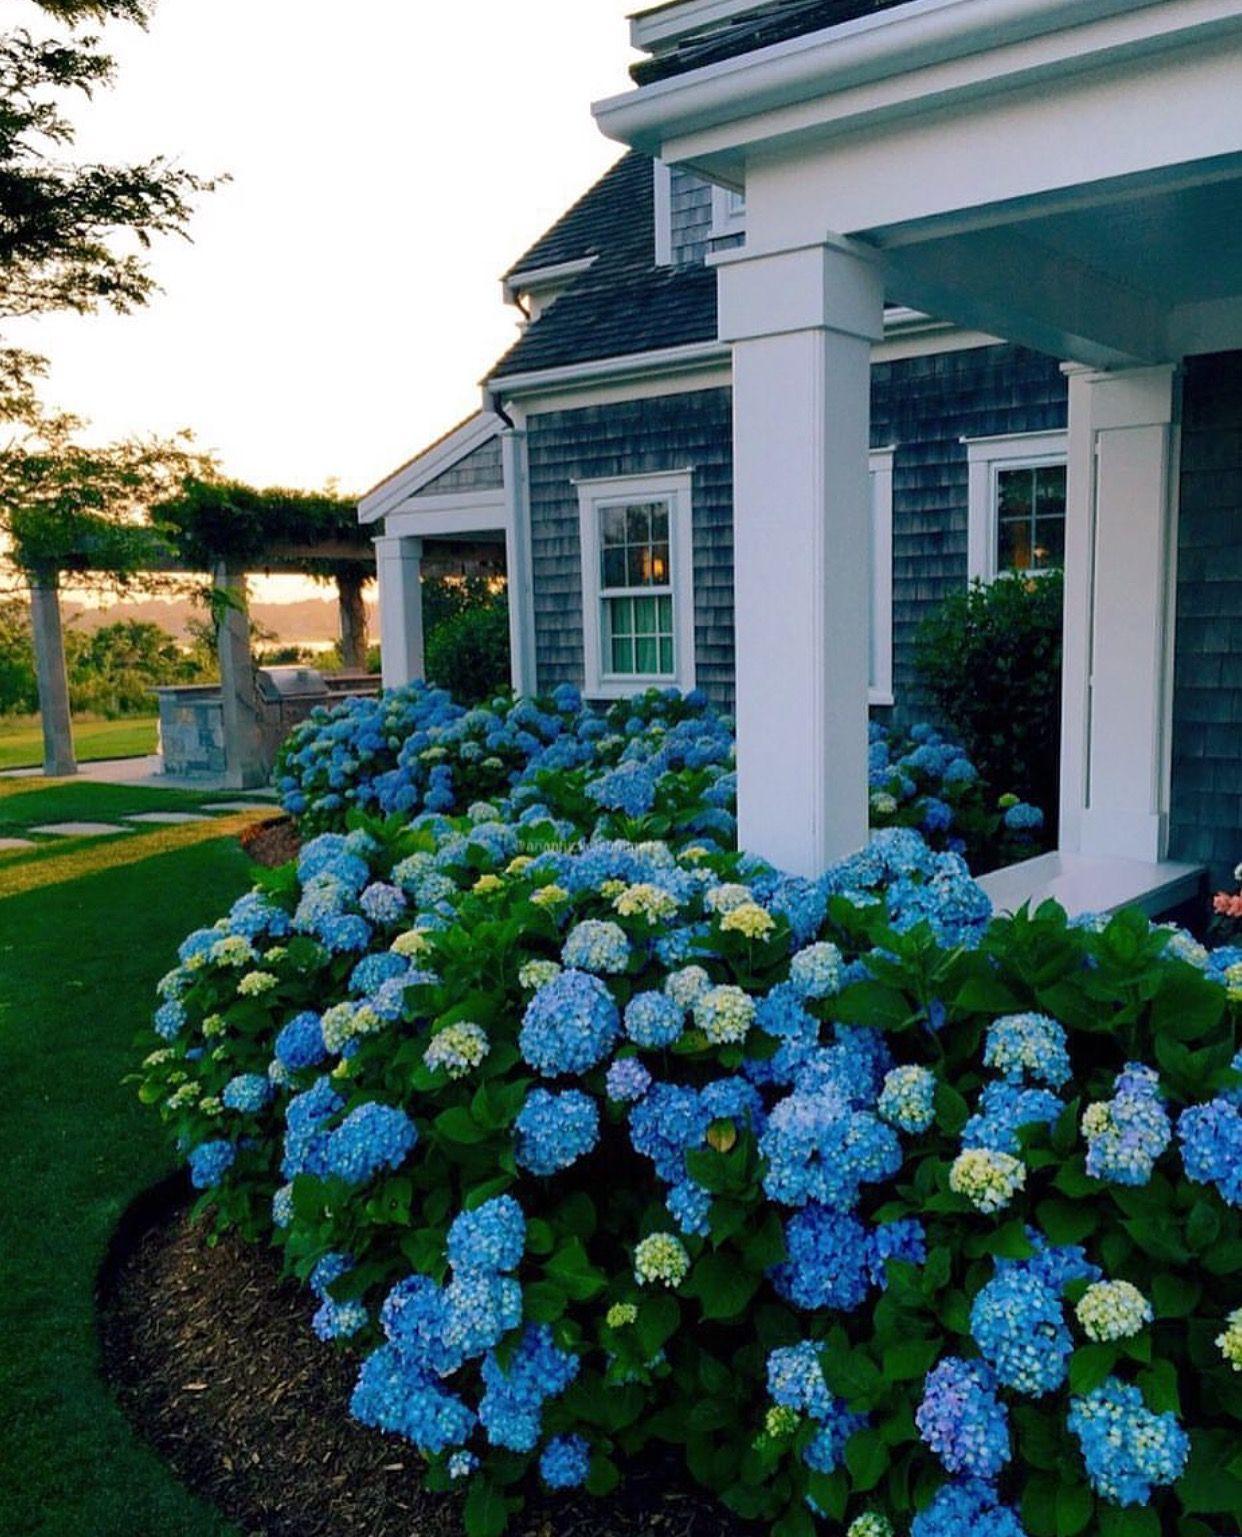 via @kristywicks #worldsuniquedesigns #loveit #blue #green #design #landscape #landscapedesign #landscapedesigner #exterior #exteriordesign #exteriordesigner #designer #tasarım #mavi #yeşil #mimarlık #mimari #mimaritasarım #peyzaj #likelikelike #iloveflowers #hortensia #architecture #architecturedesign